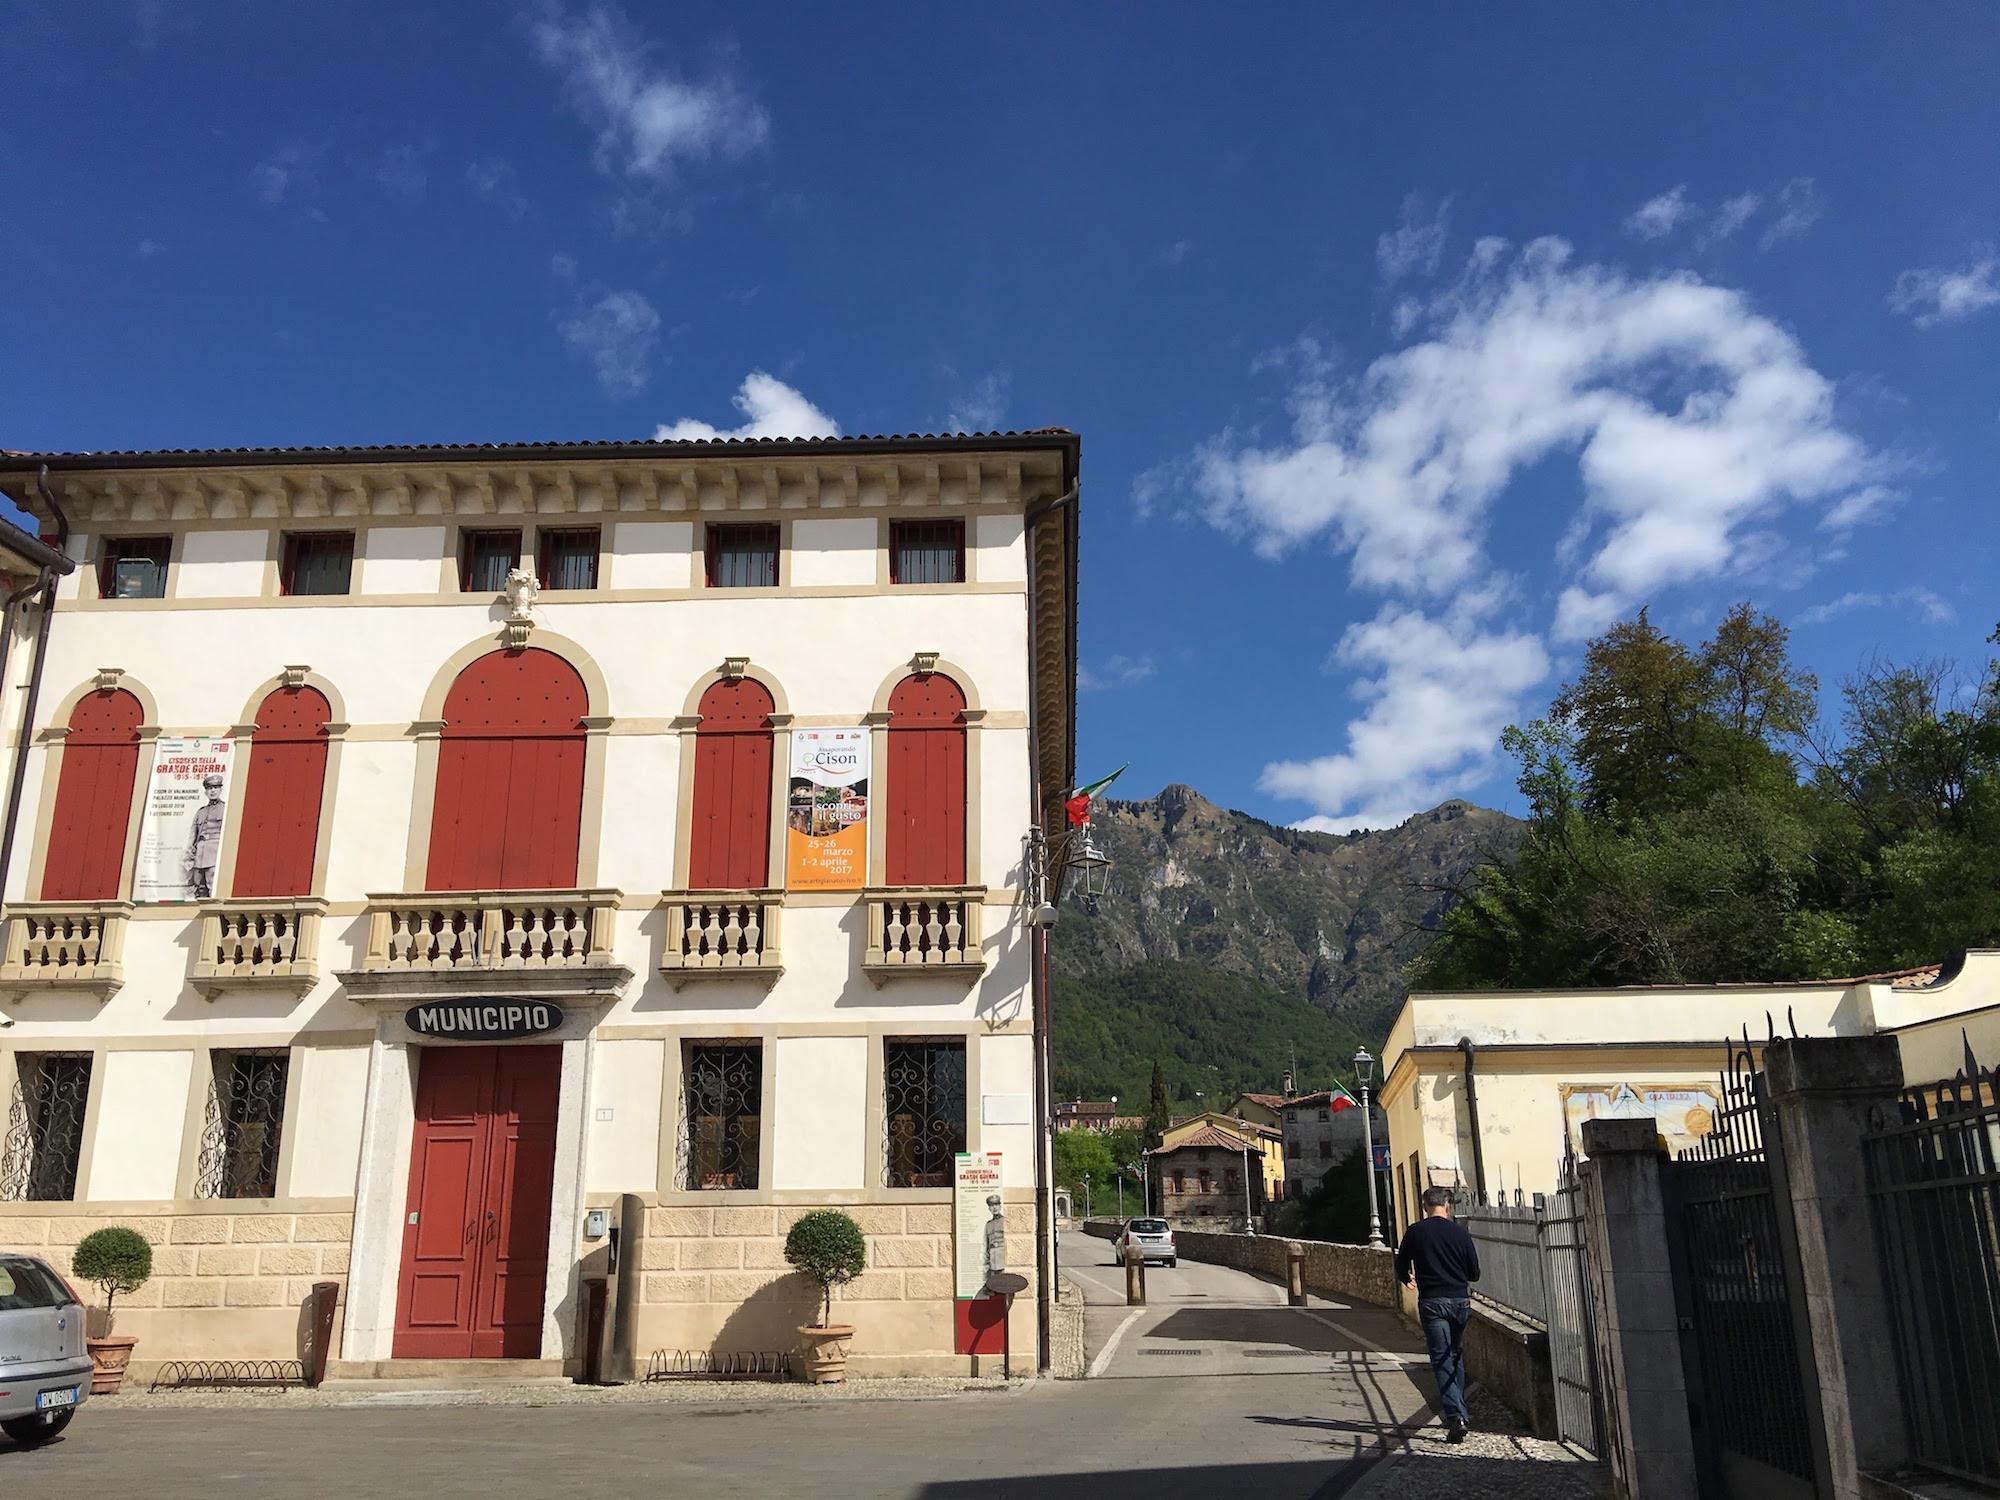 The ancient town hall building of Cison di Valmarino.